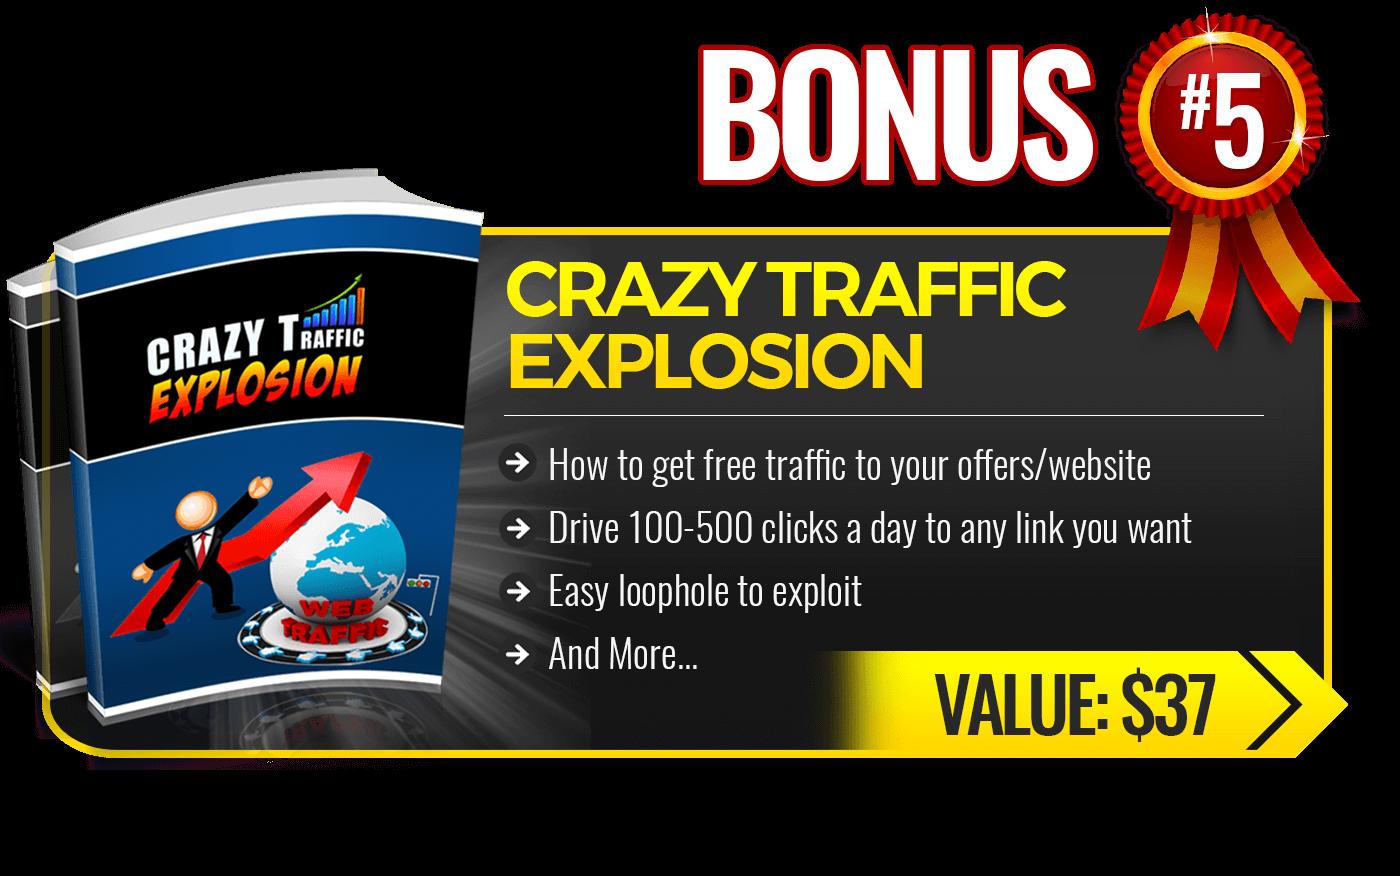 5. Crazy Traffic Explosion